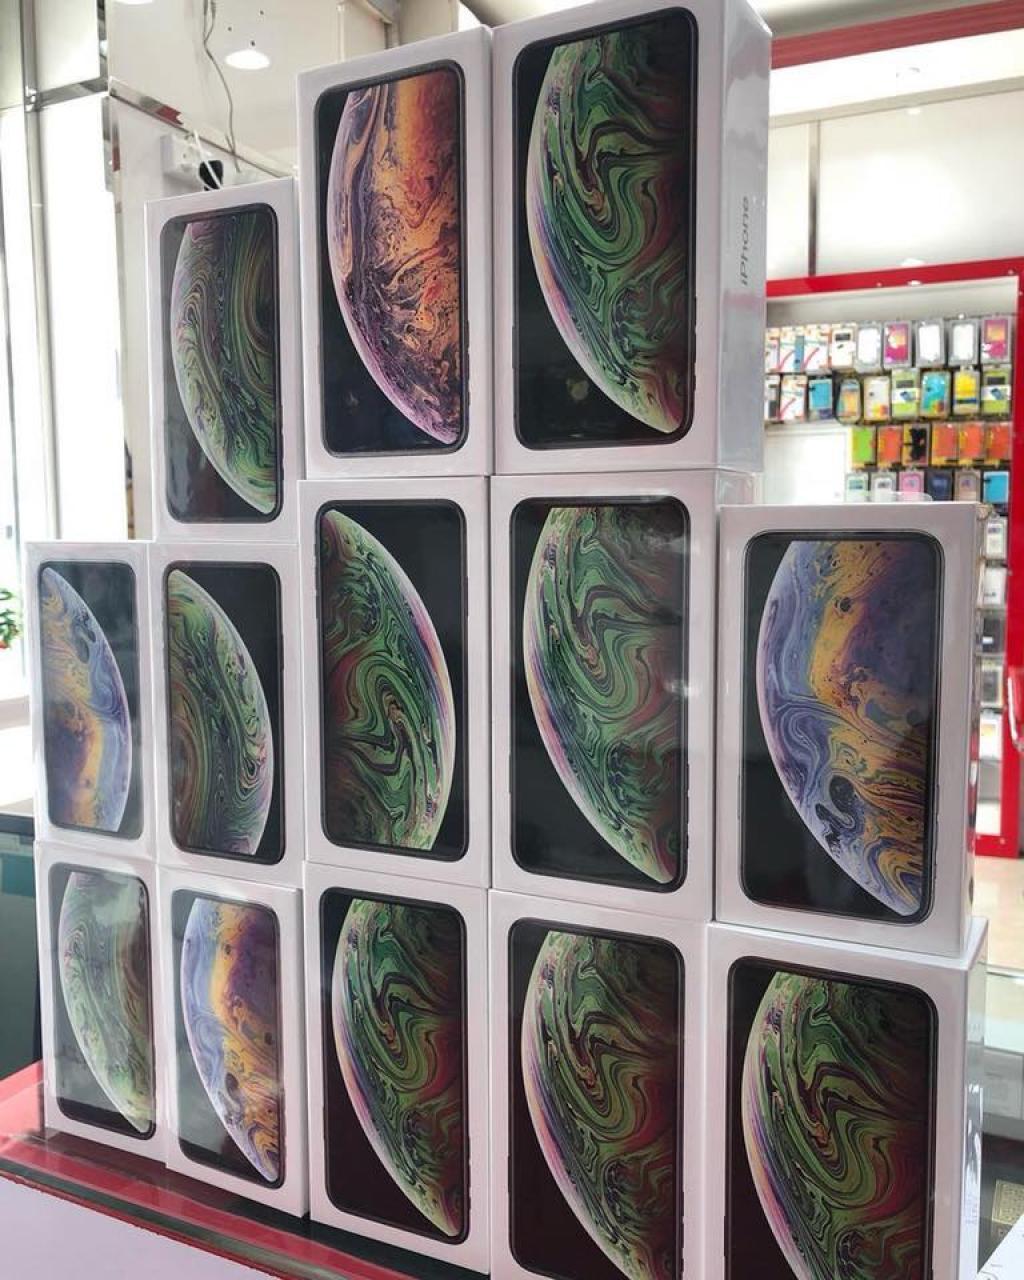 Apple iPhone XS Max iPhone XS 530 EUR WhatsAp +447